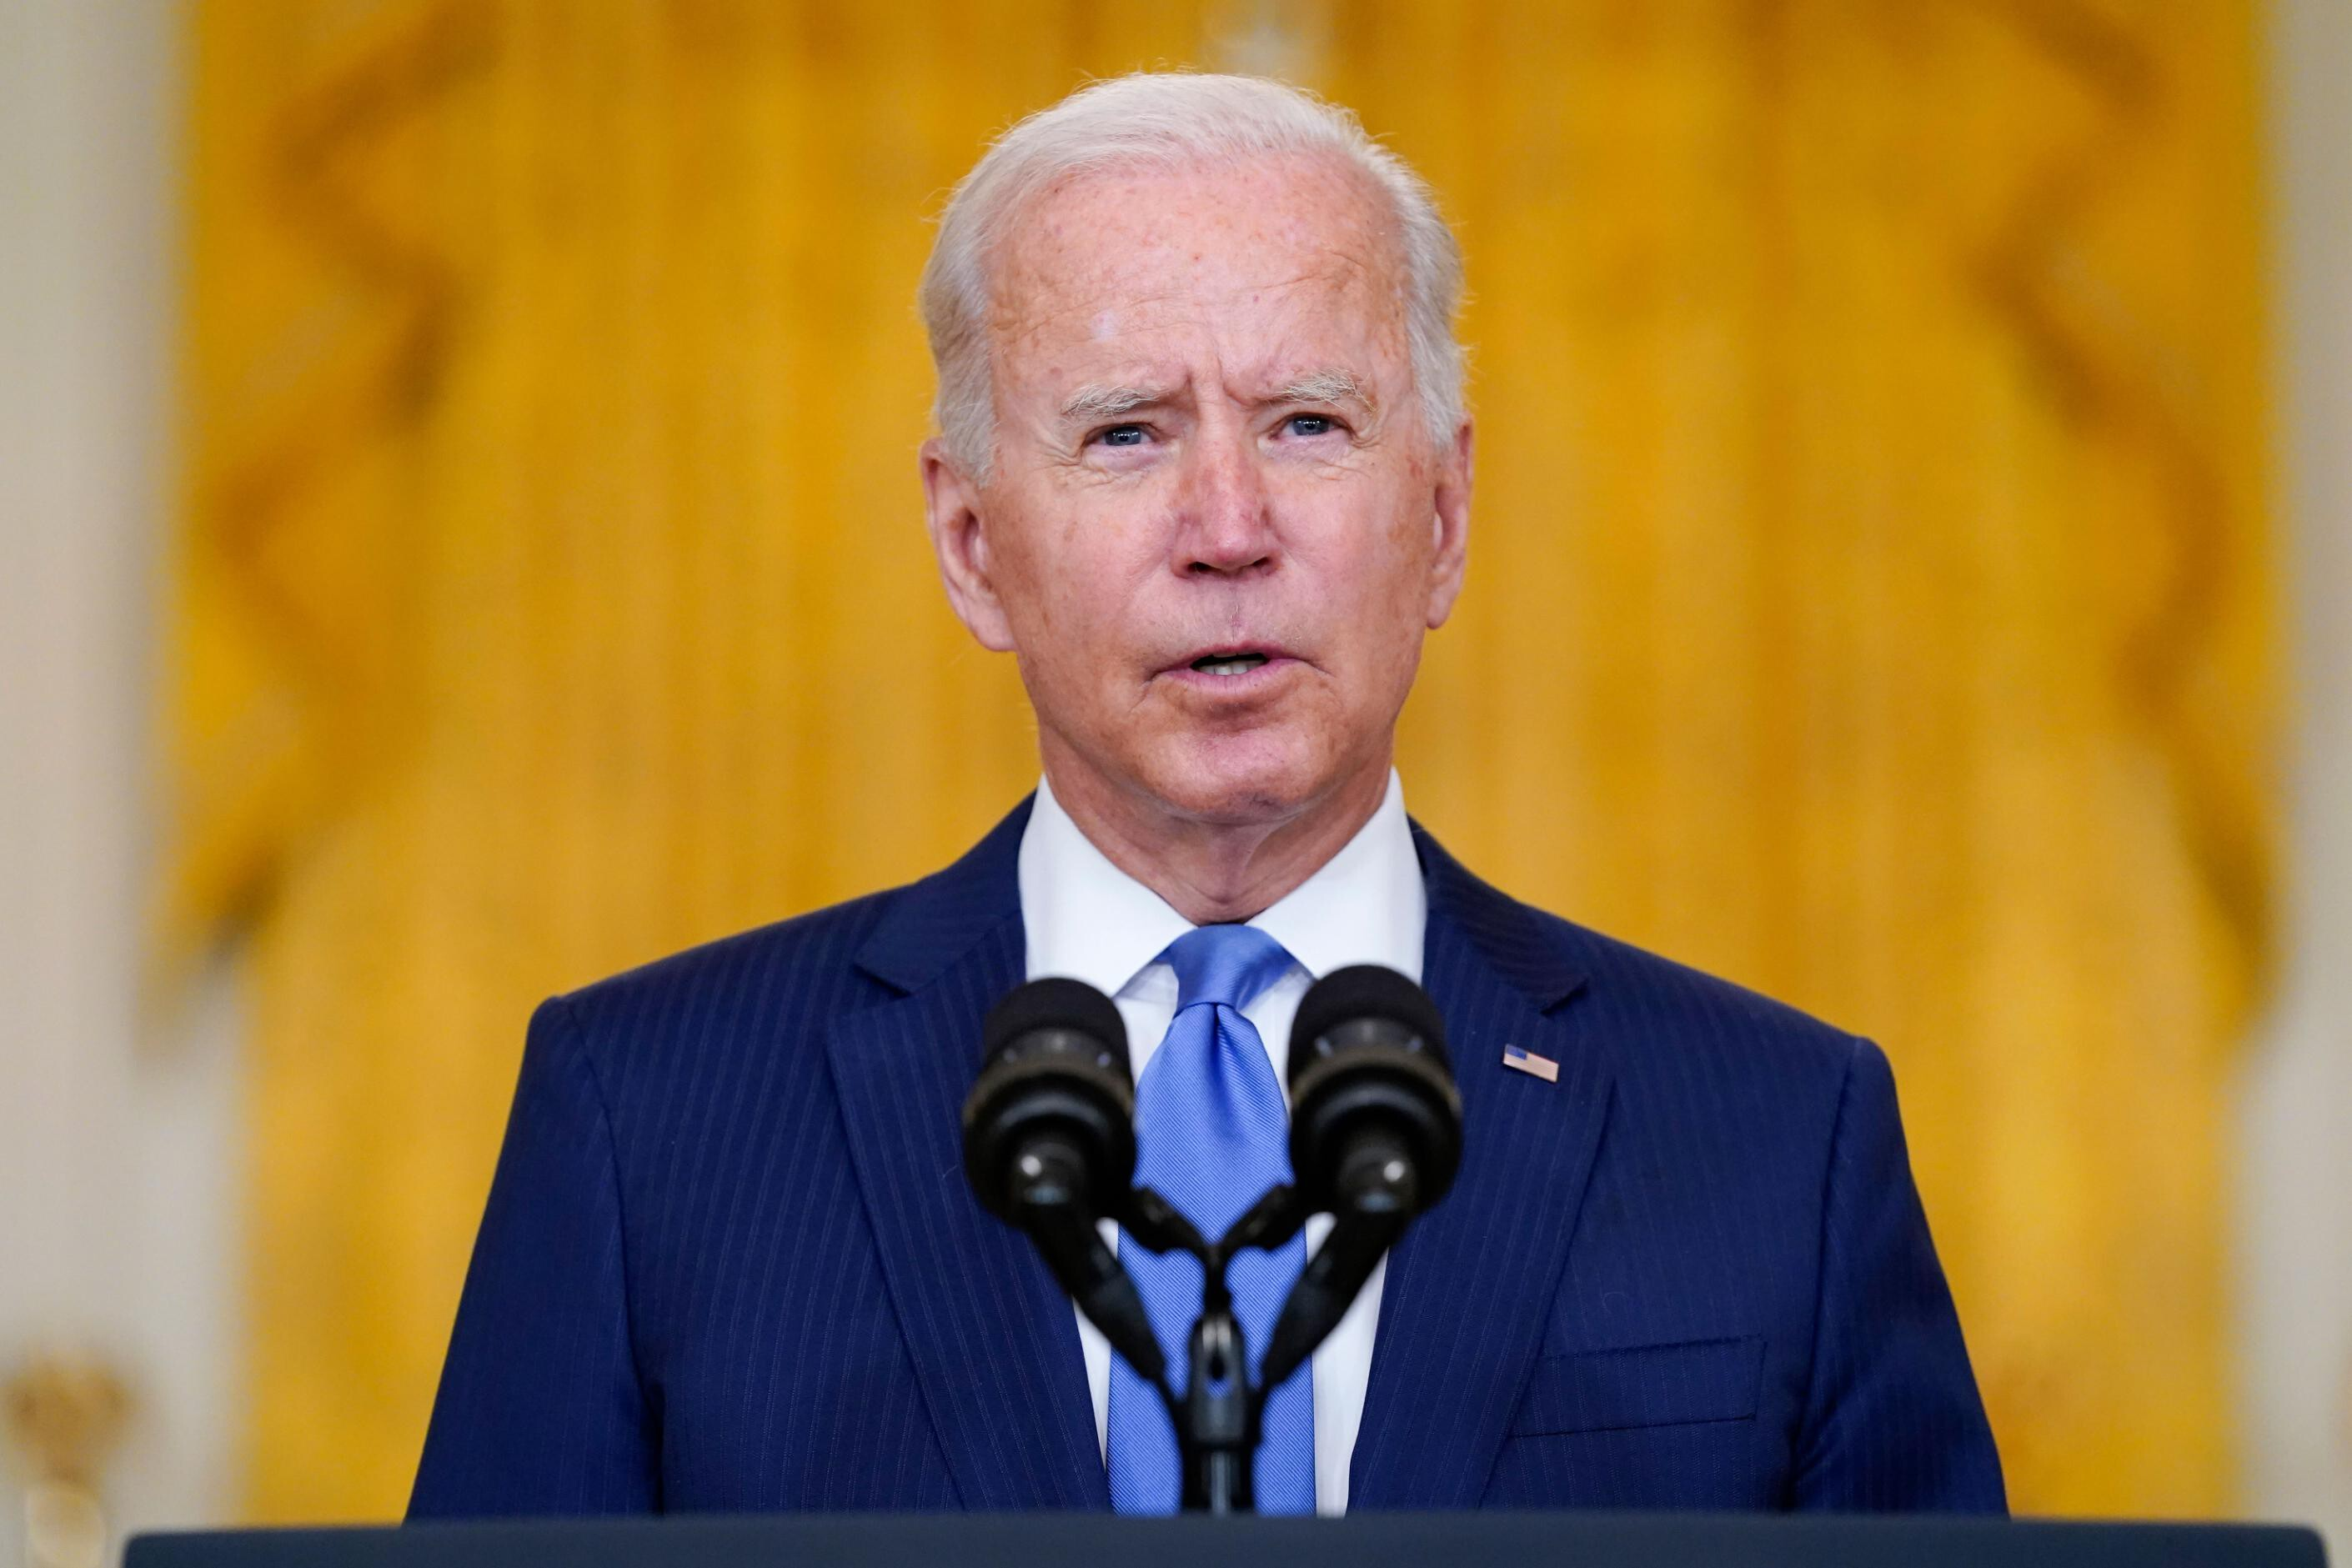 Biden criticizes Senate Republicans after police reform negotiations end without a deal